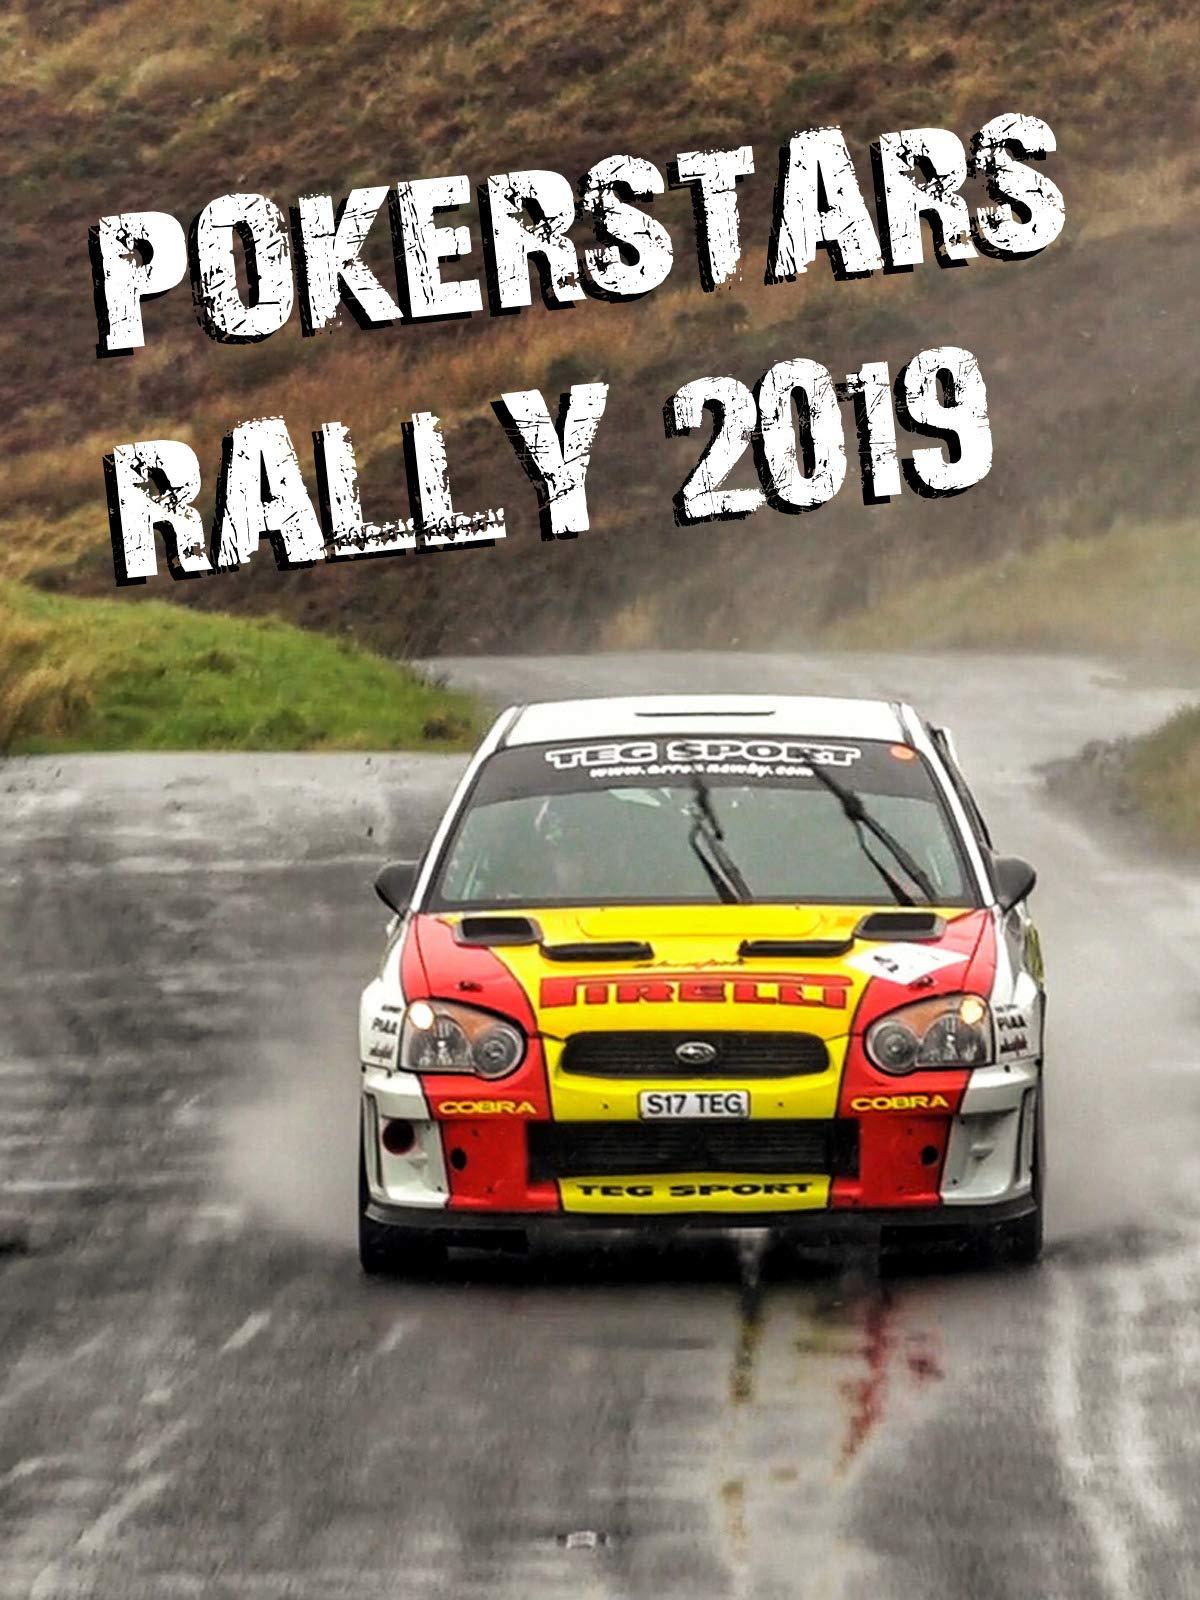 Pokerstars Rally 2019 on Amazon Prime Video UK